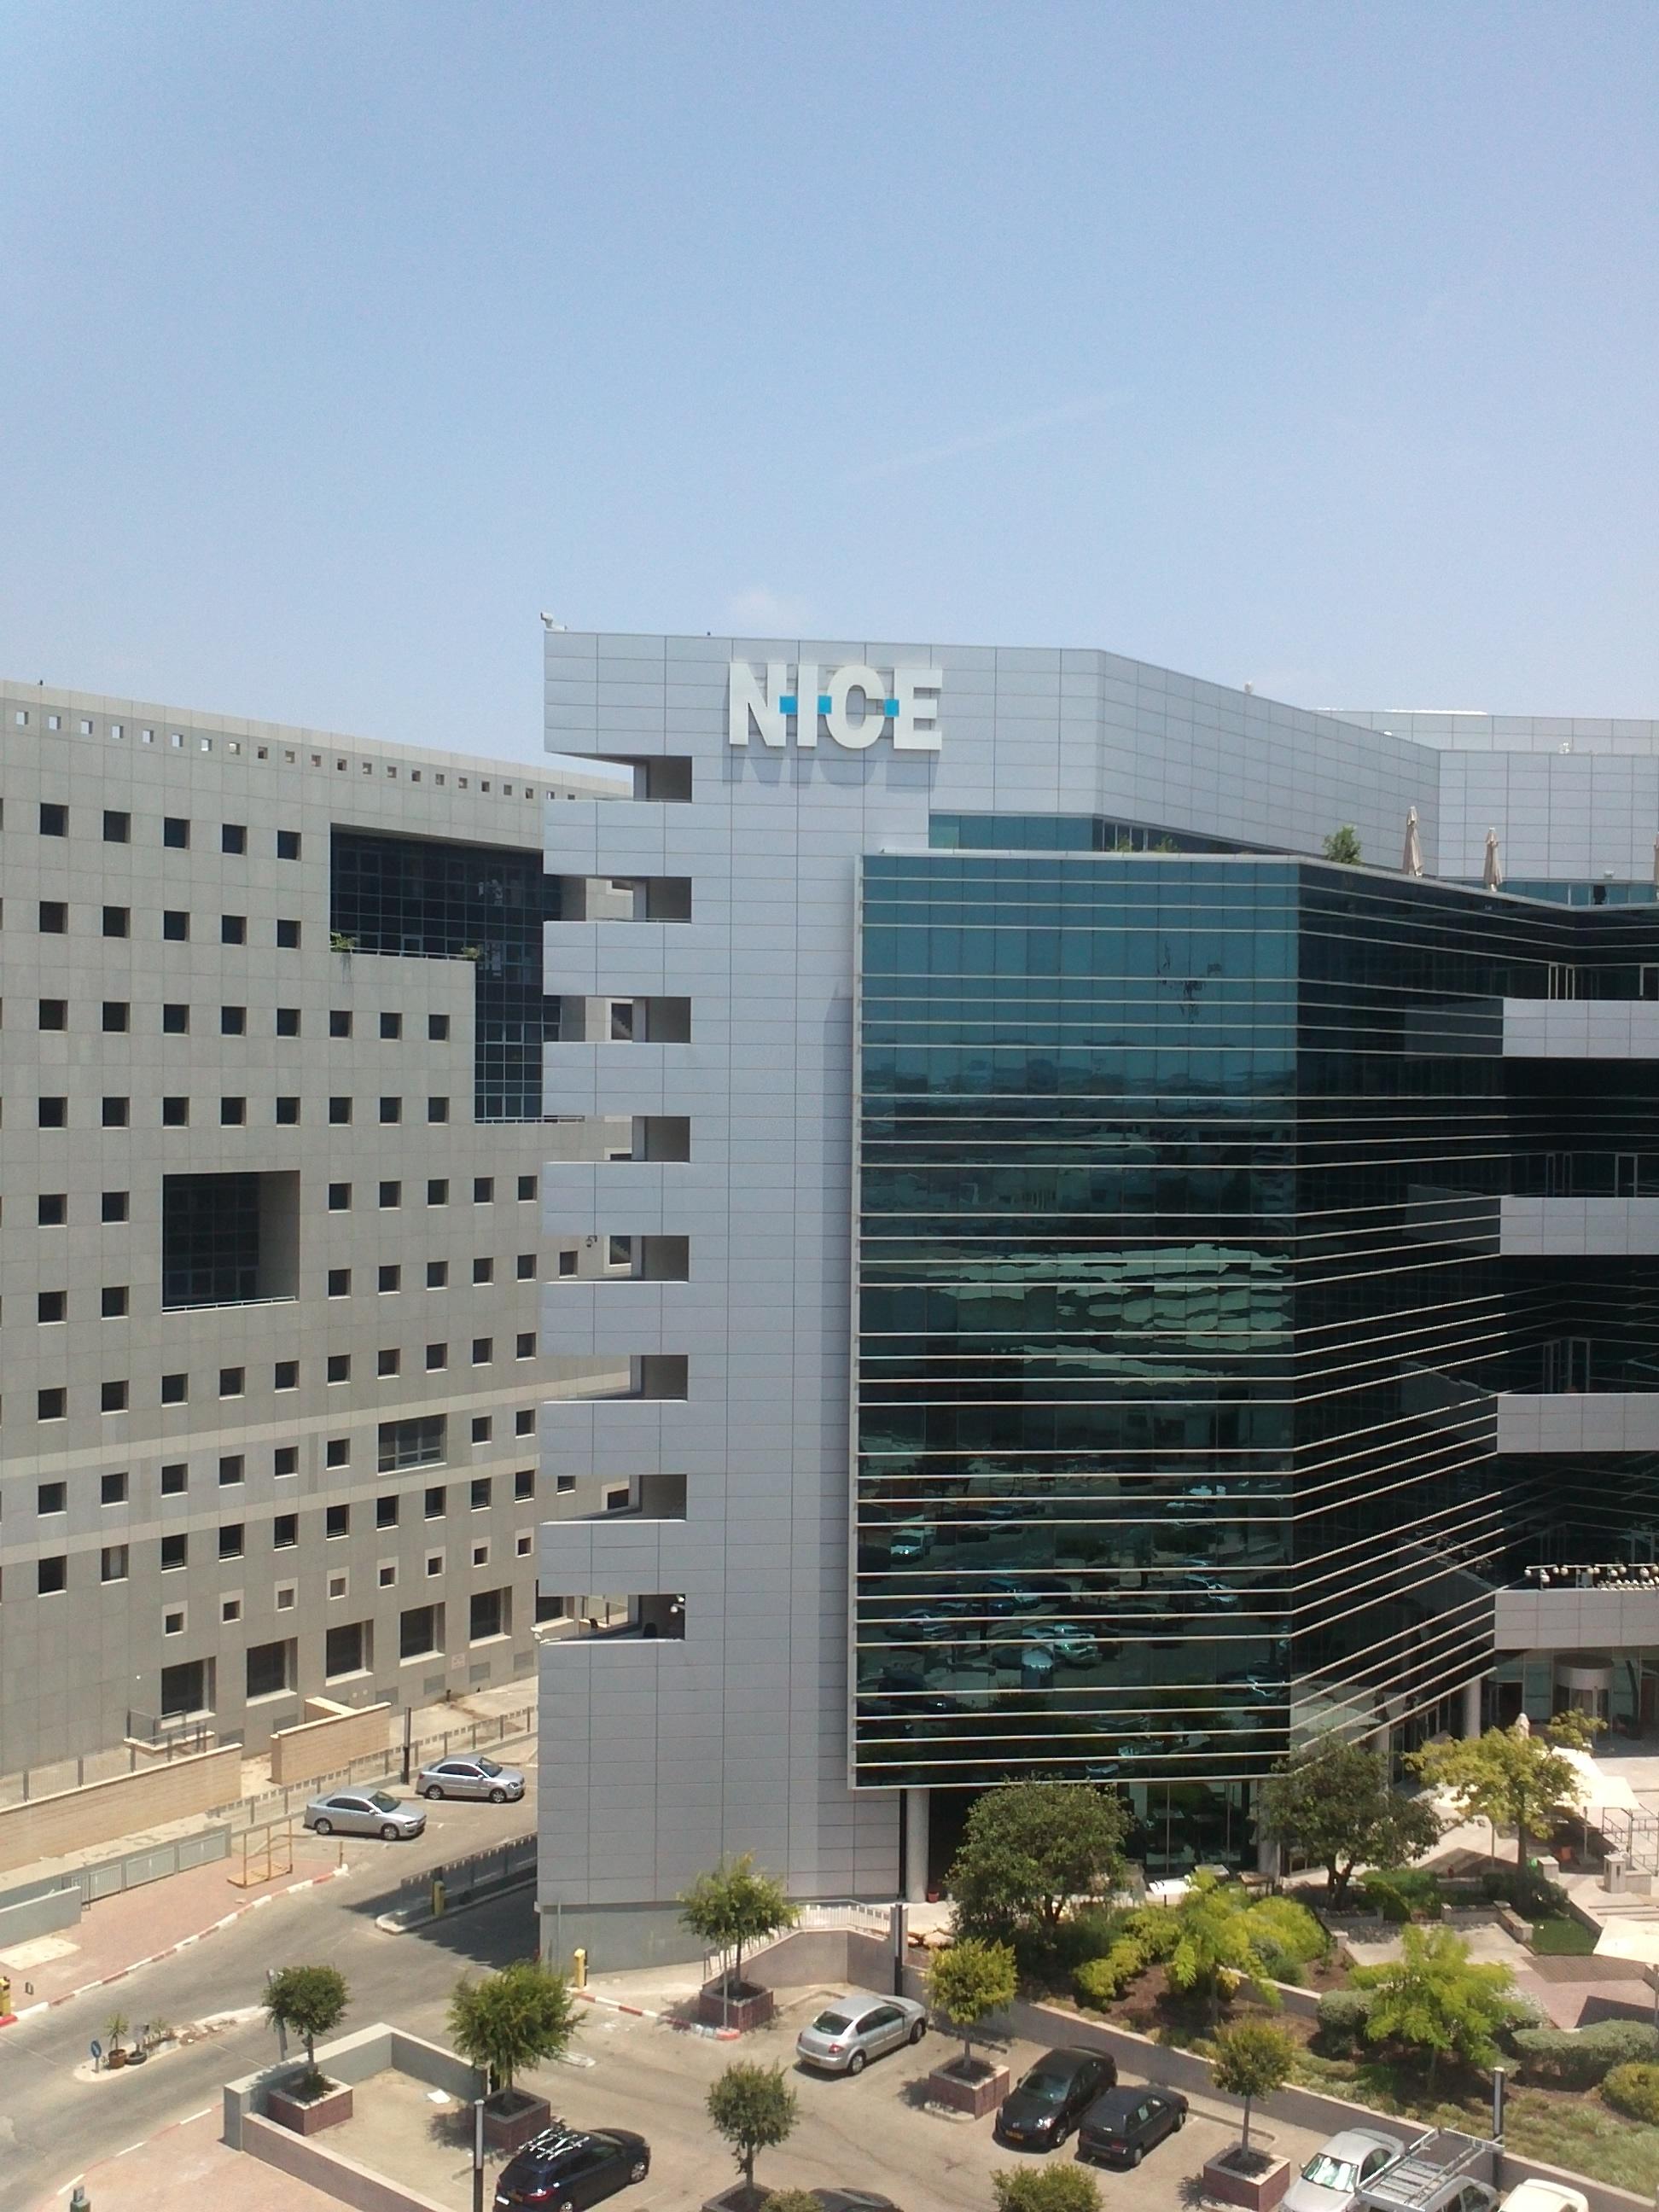 NICE Ltd  - Wikipedia